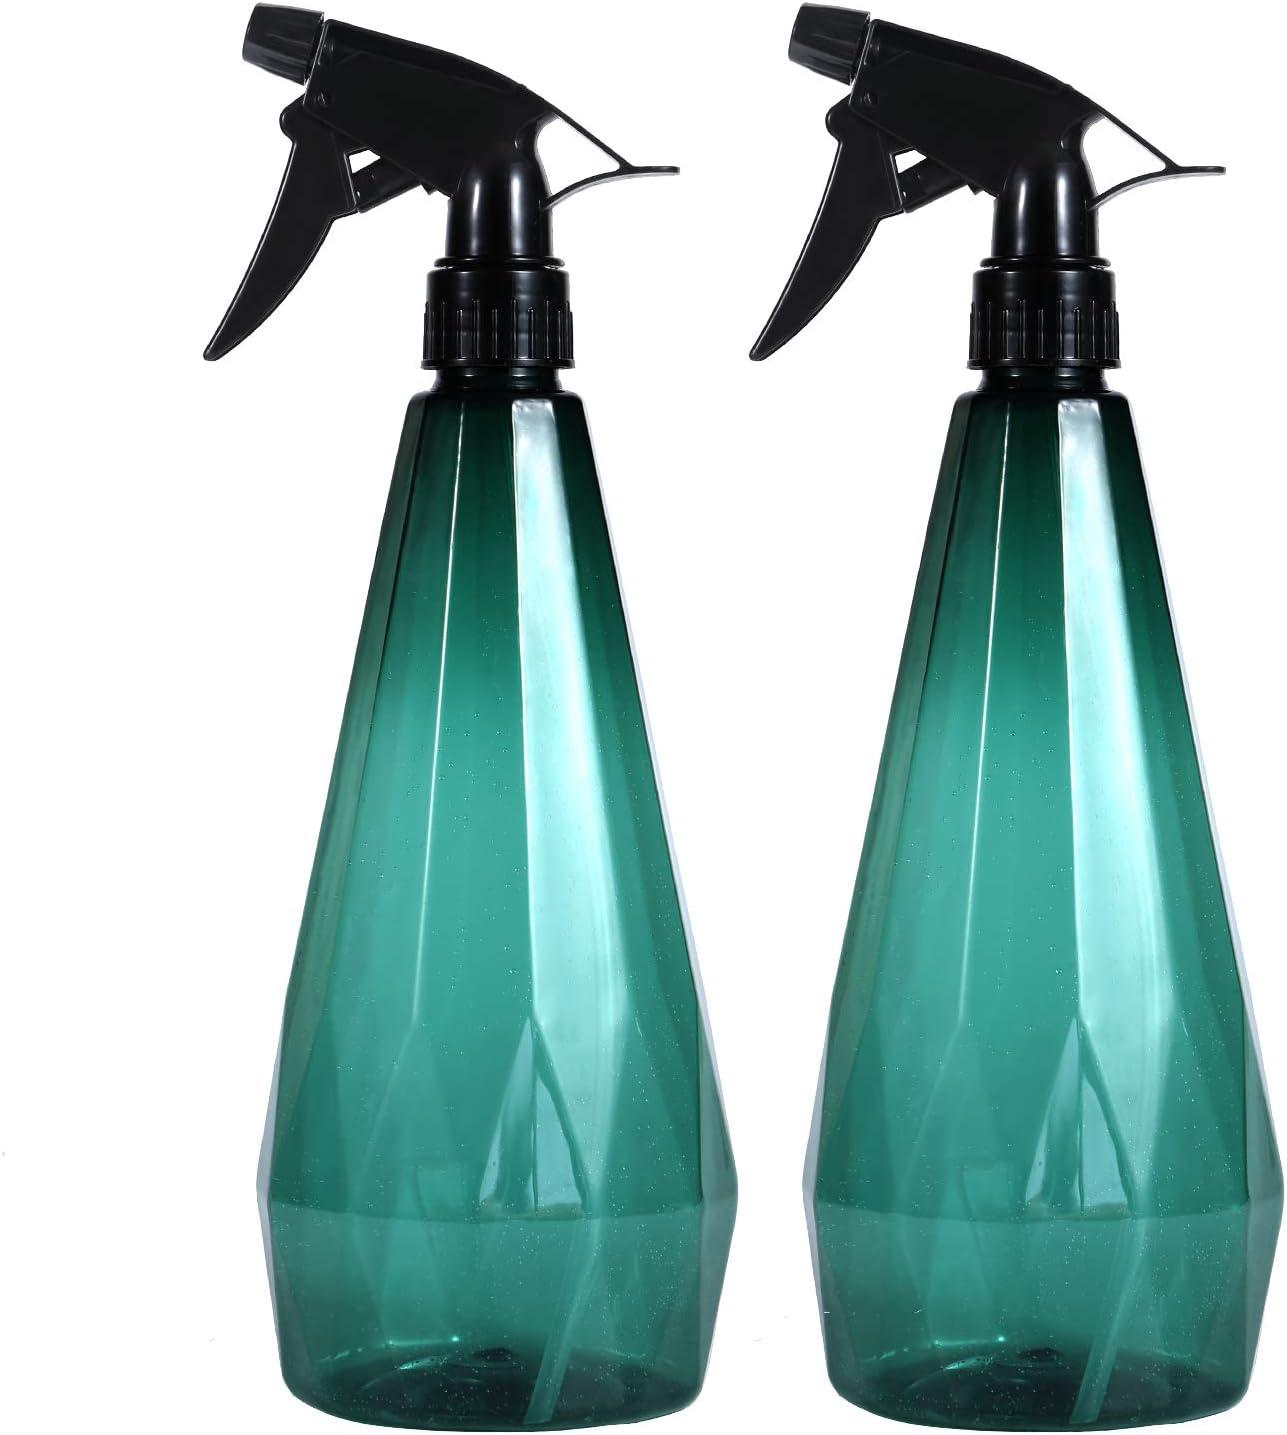 1L//32 oz Plant Mister Leak Proof Empty Mist Water Bottle for Cleaning Solution Hair Pet Flowers Plants Garden Vaupan Plastic Spray Bottles Trigger Sprayer with Adjustable Nozzle Green